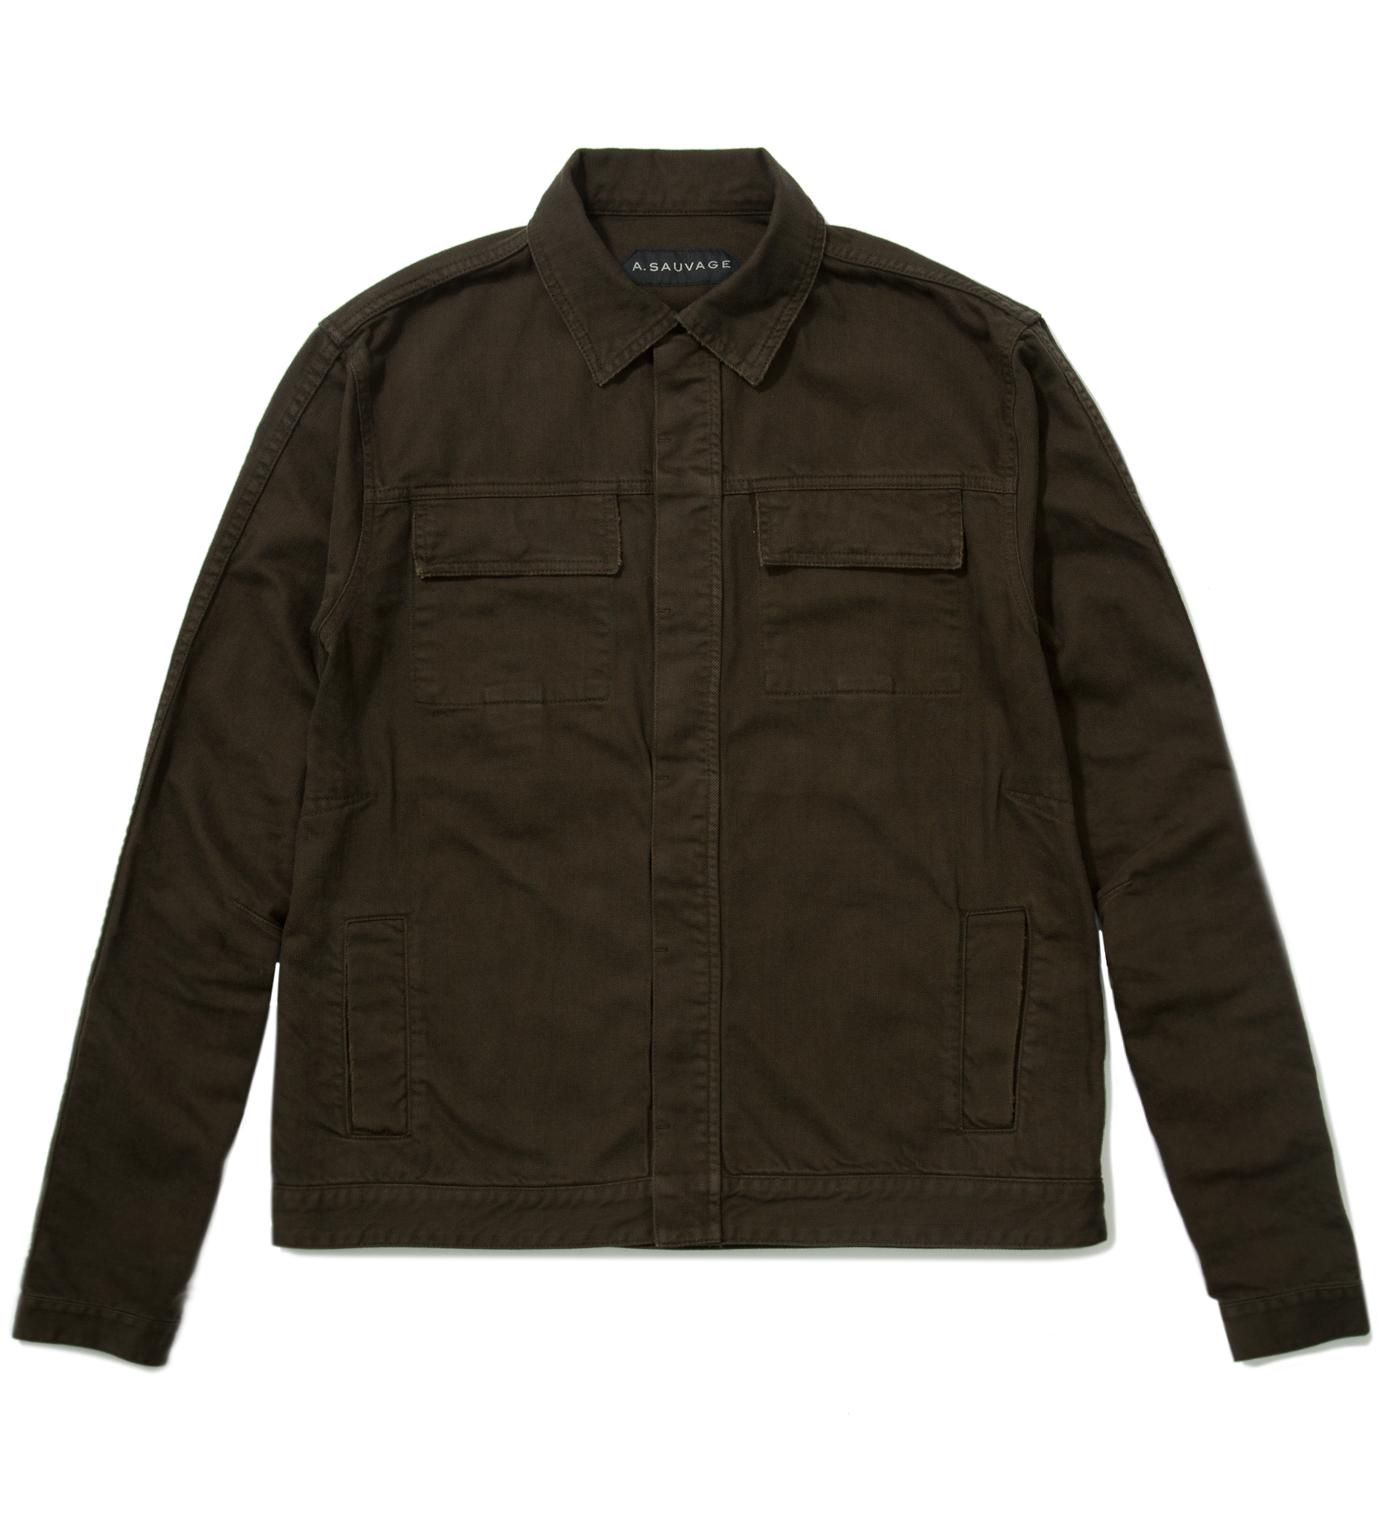 A. Sauvage Green Denim Jacket